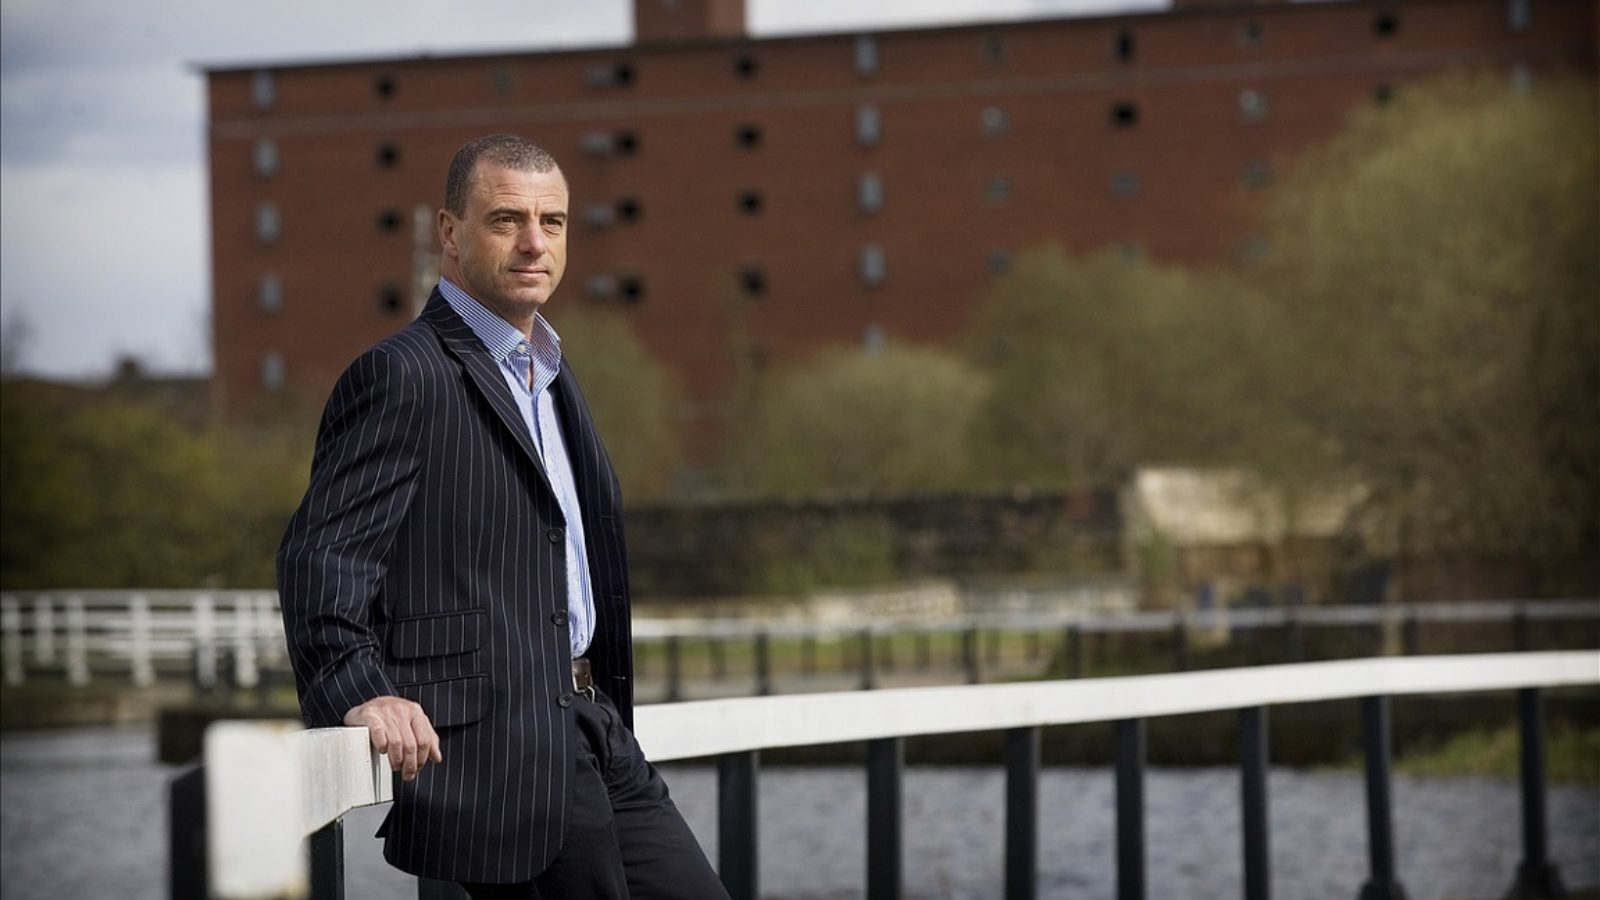 Steve Dunlop, chief executive officer, Scottish Enterprise